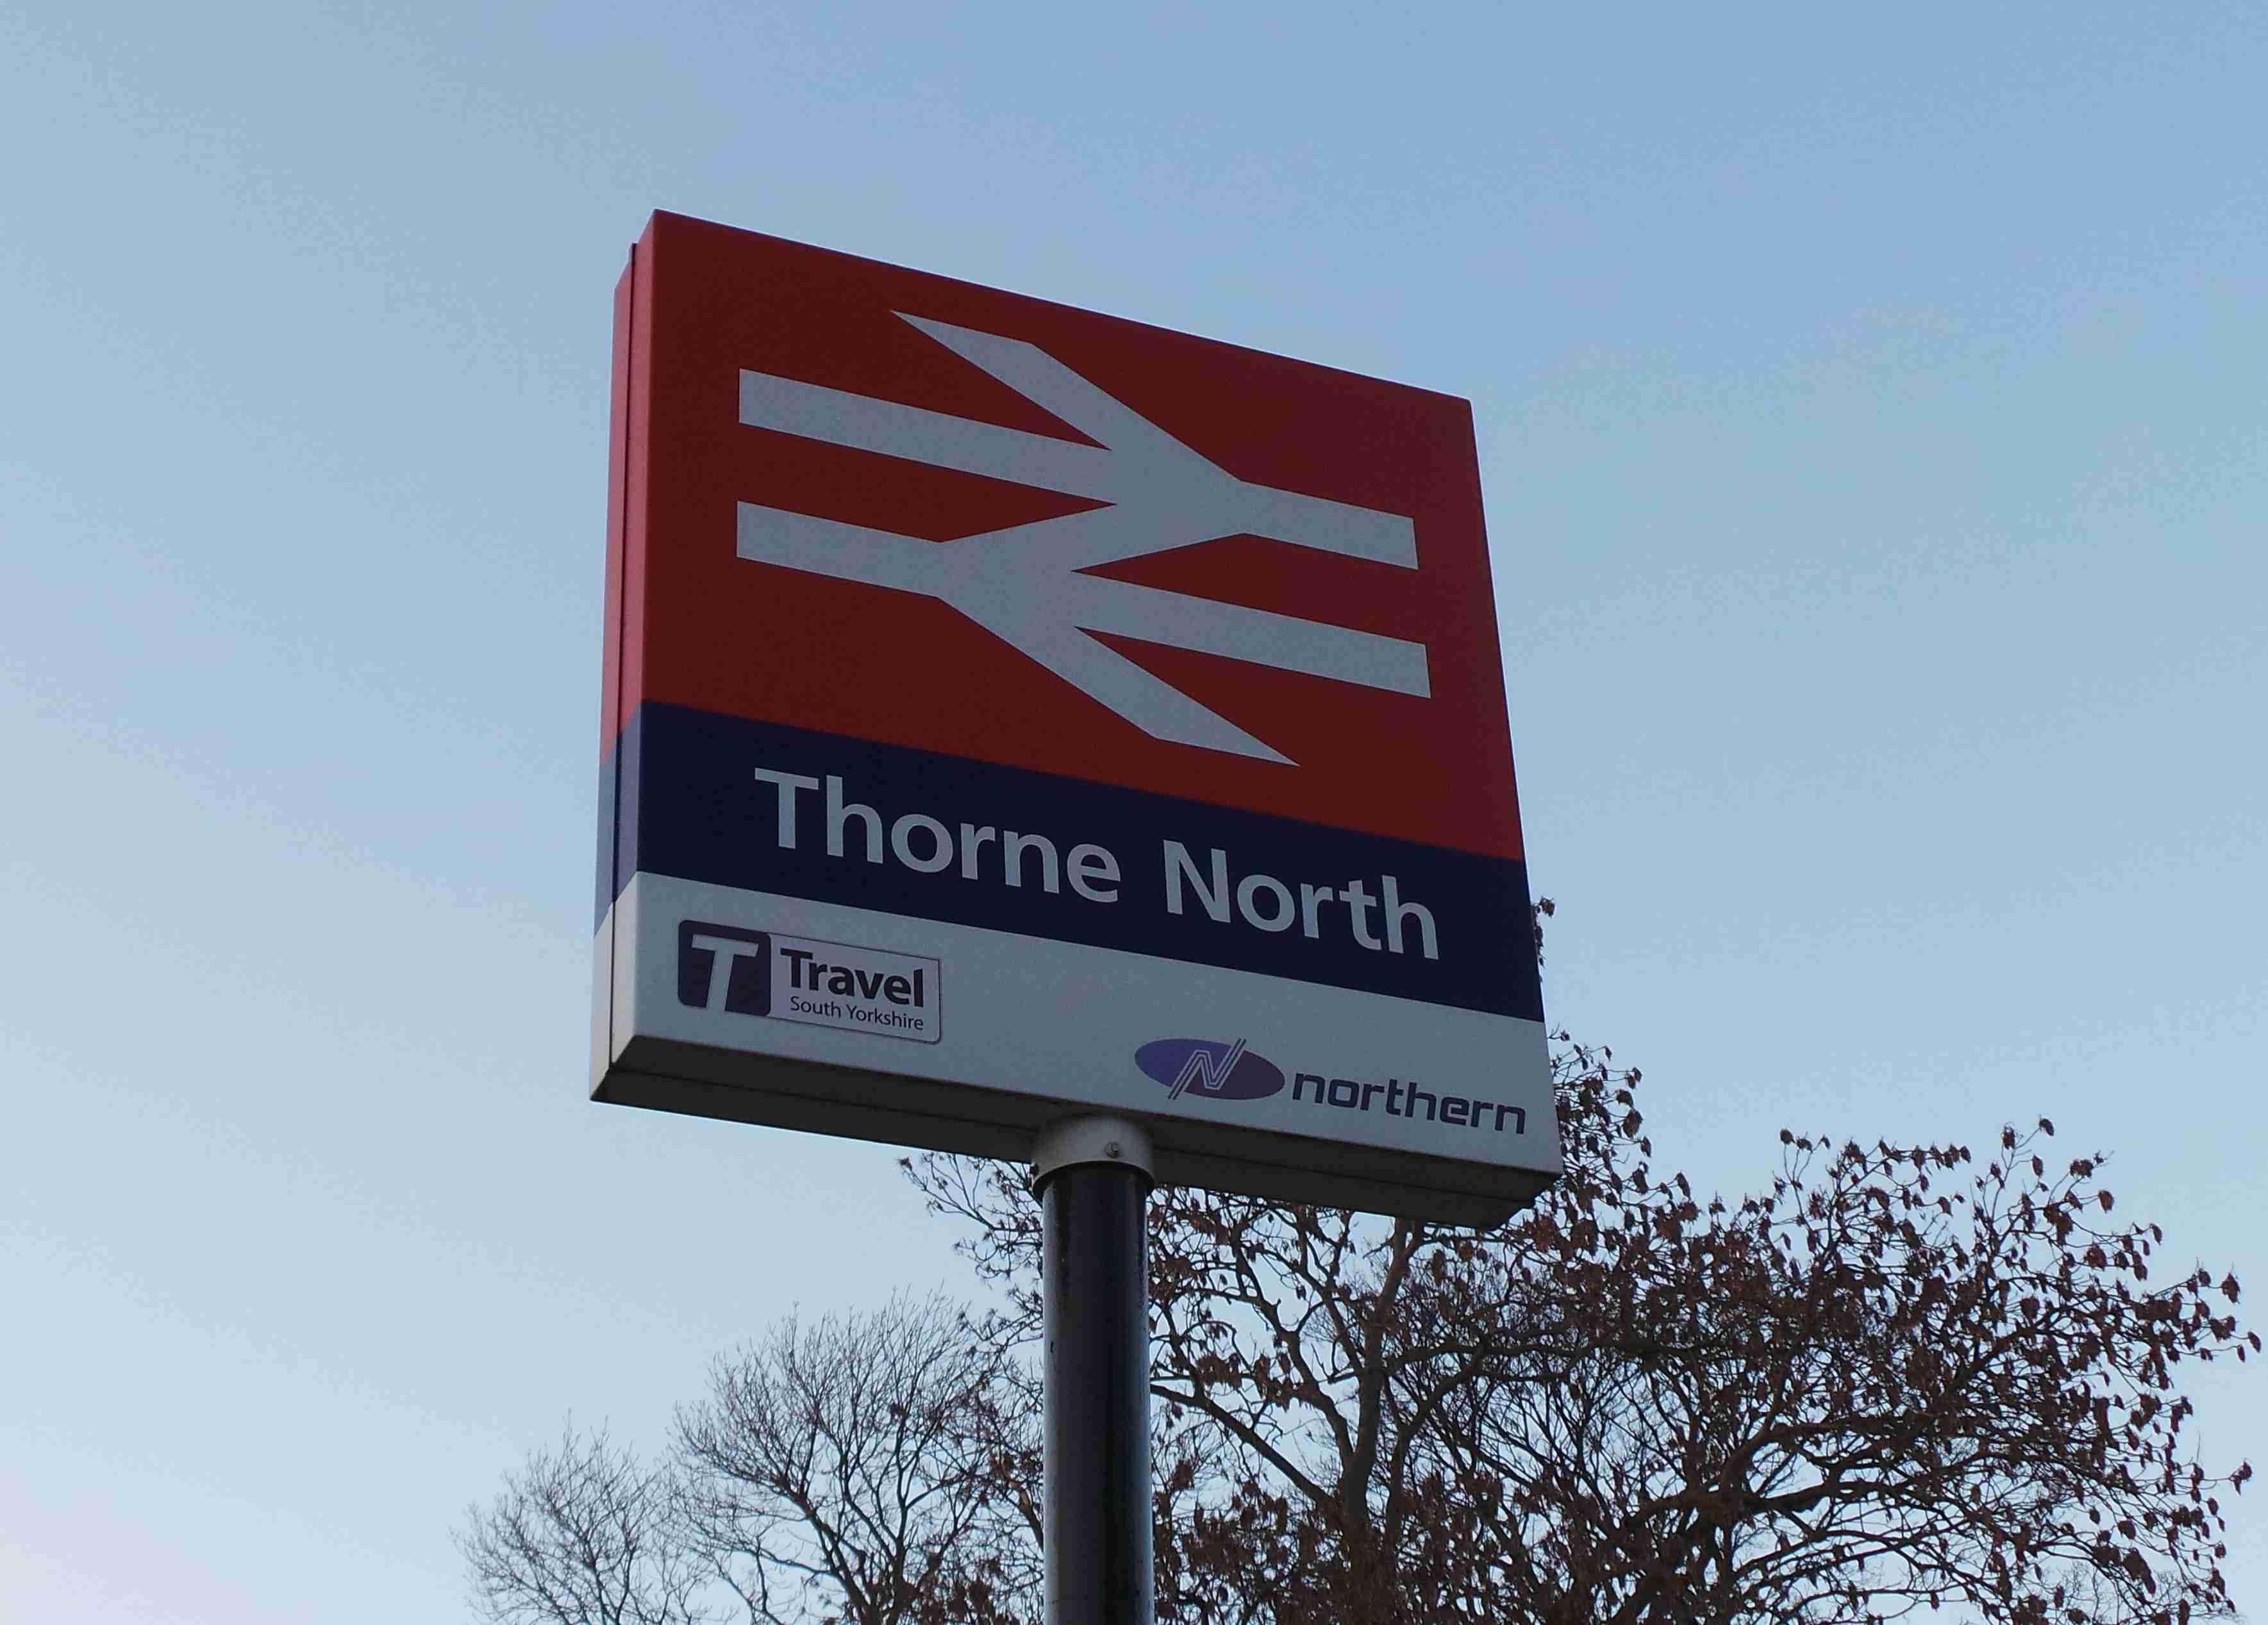 Thorne North Safety Award